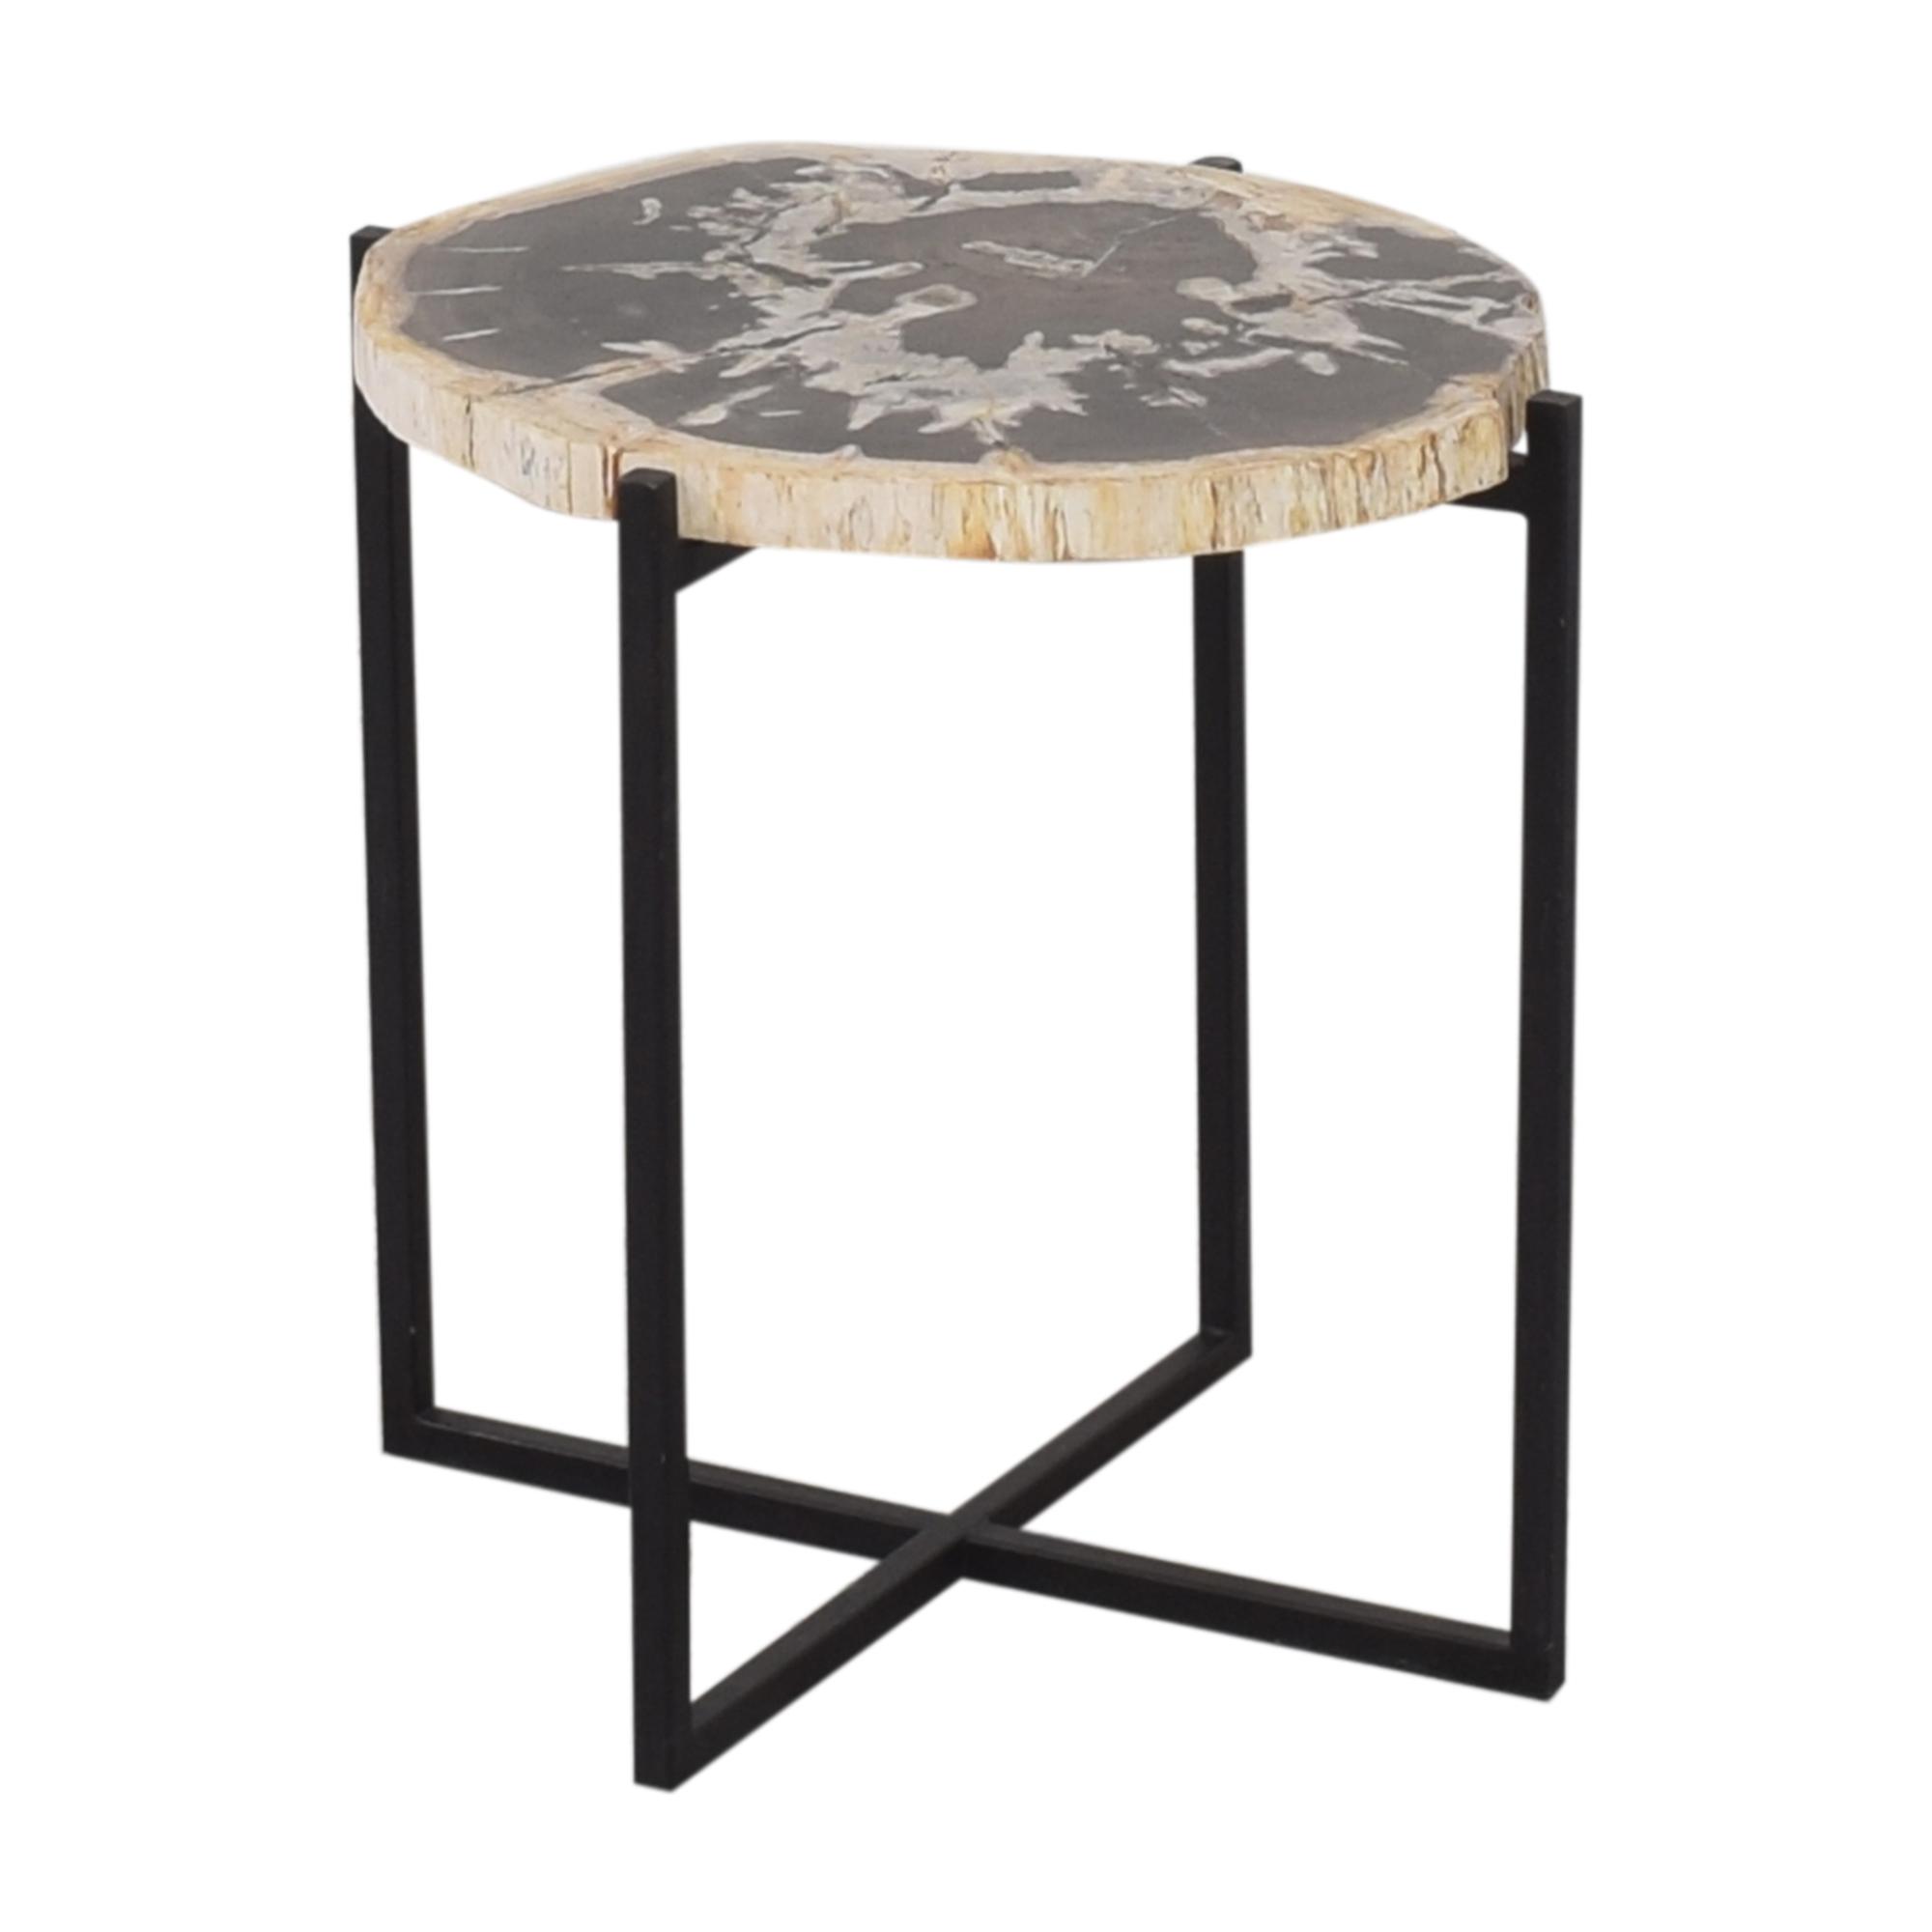 West Elm West Elm Petrified Side Table for sale